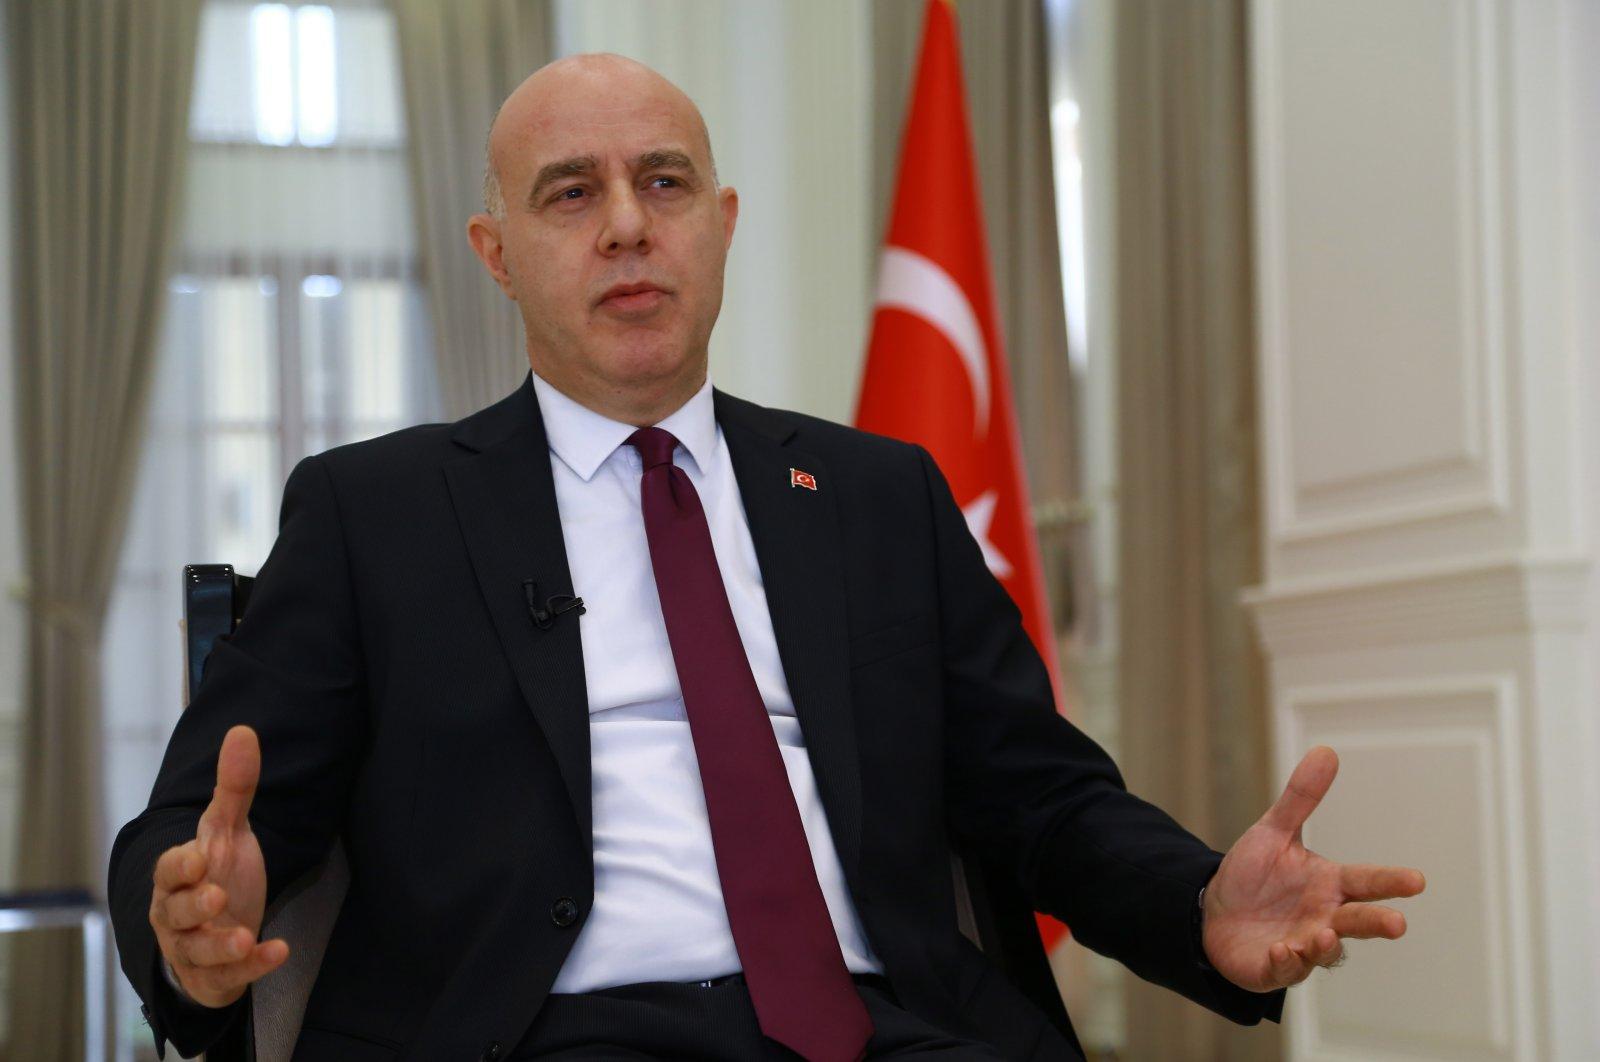 Ali Rıza Güney, Turkey's ambassador to Baghdad, speaks during an interview in Baghdad, Iraq, May 6, 2021. (AA Photo)